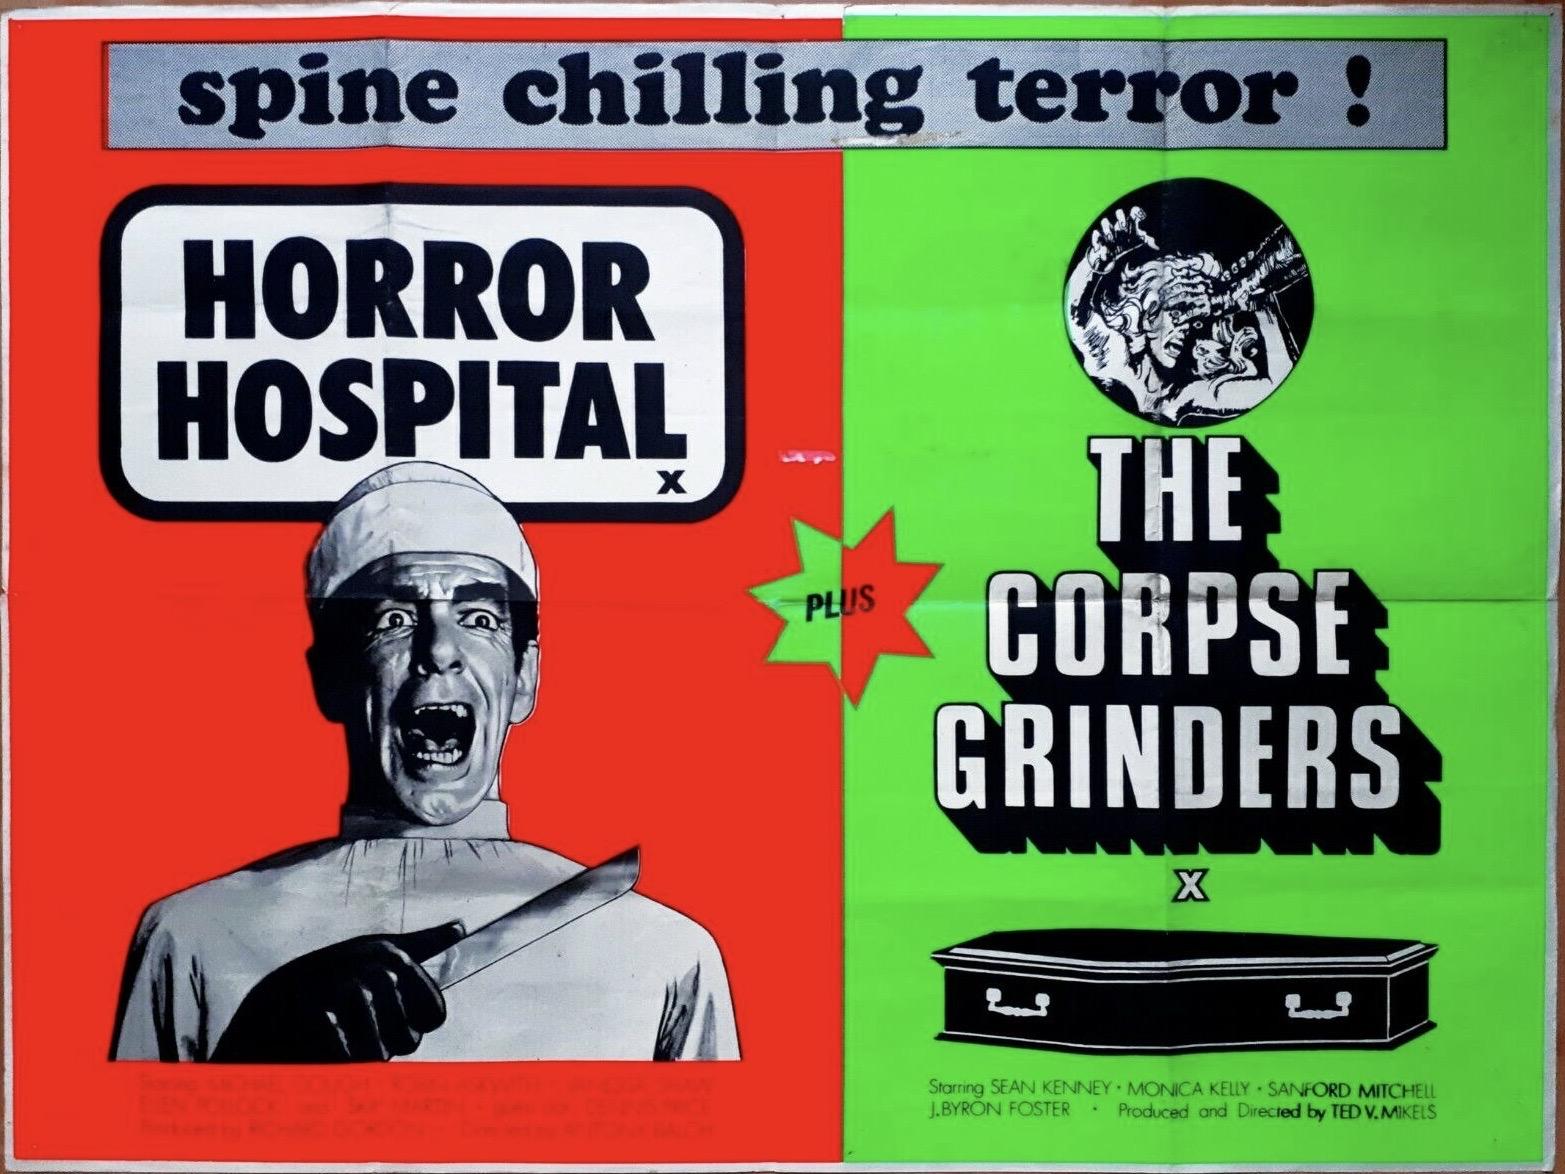 HorrorHospitalCorpseGrindersQuadPoster